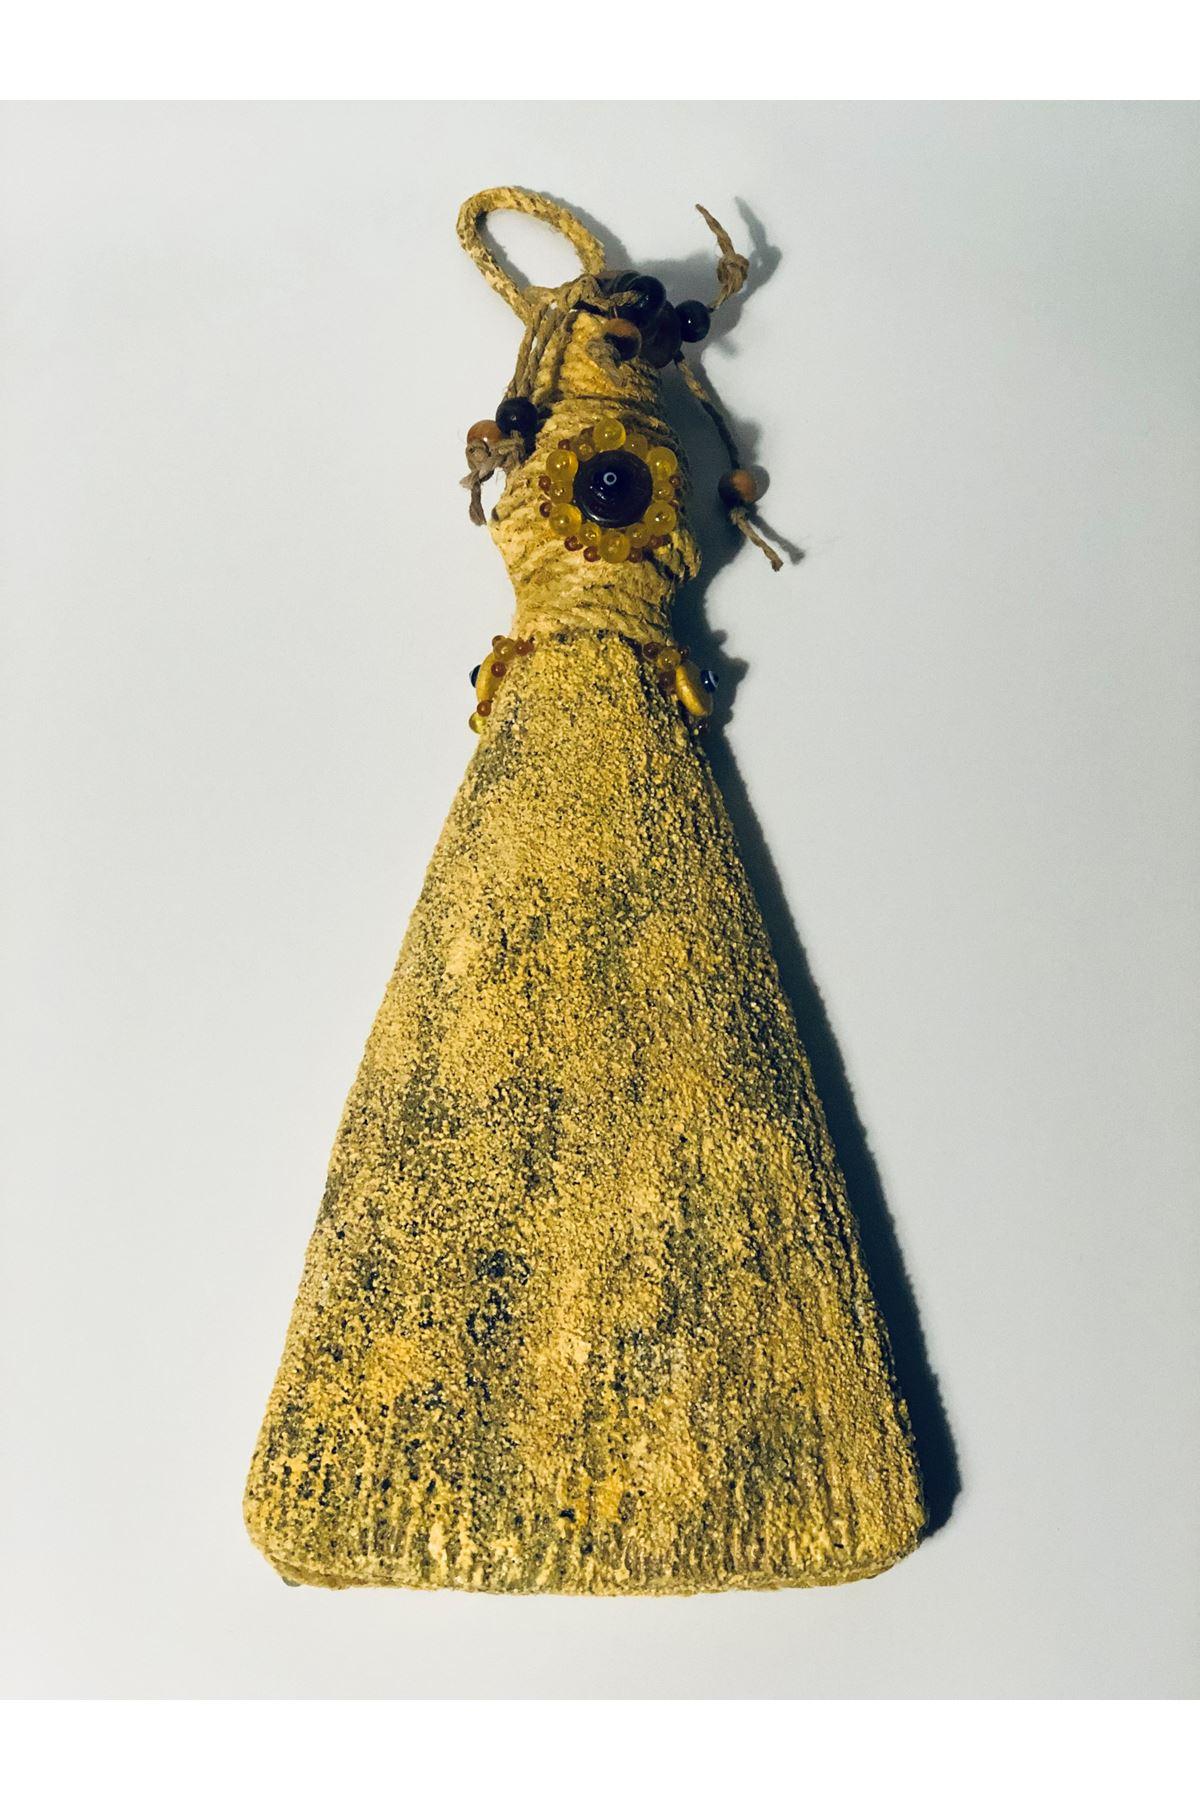 Seramik Süpürge Duvar Aksesuarı Tuval Hedıyelık